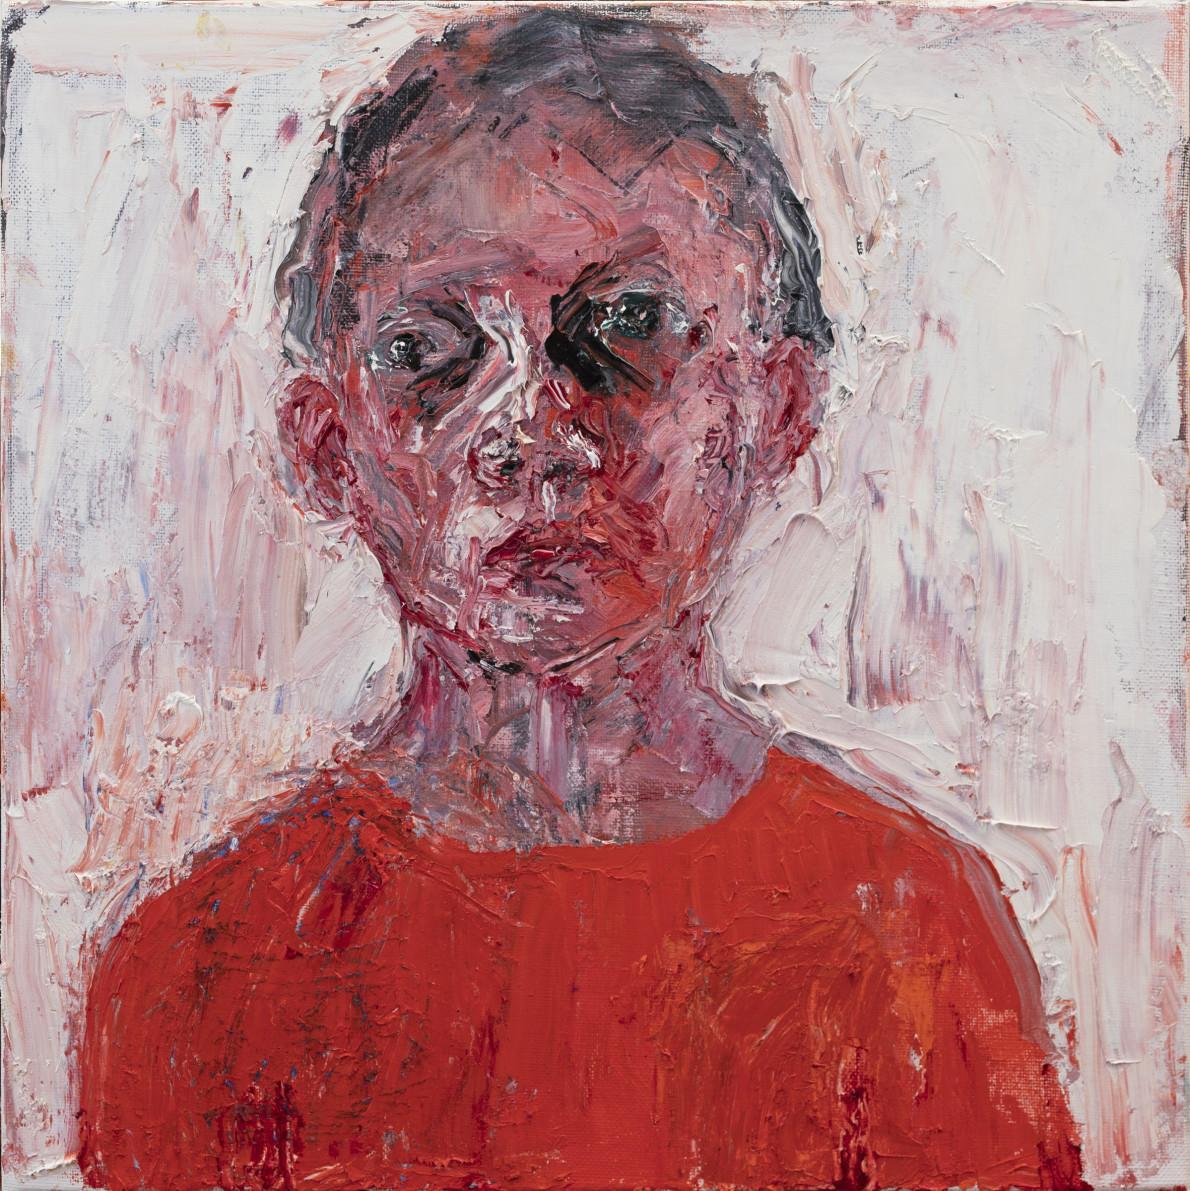 Shani Rhys James, Figure in Orange, 2021